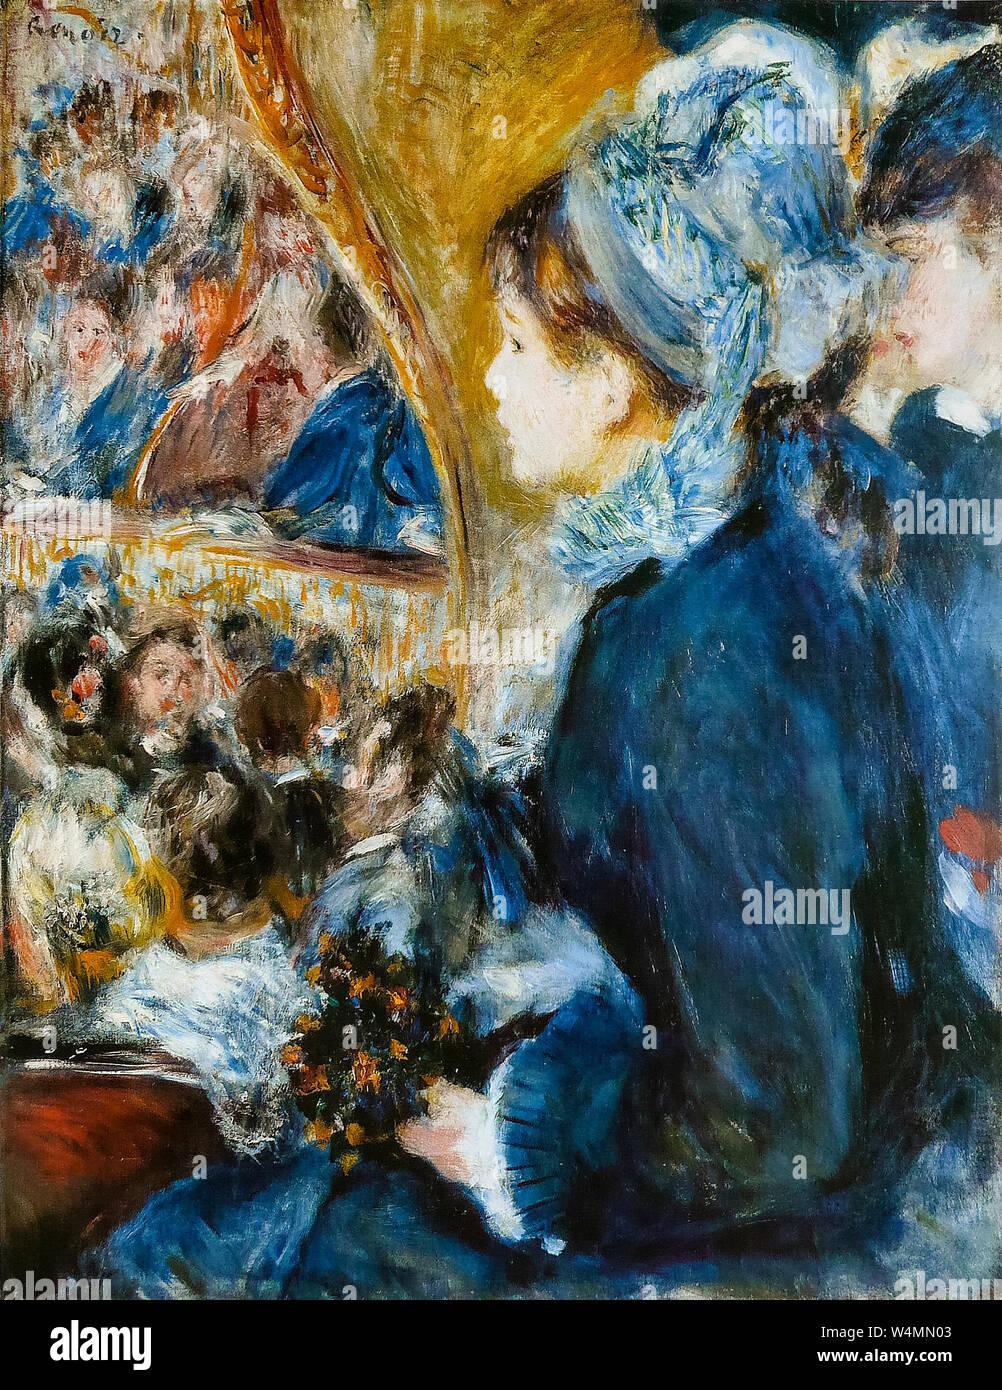 Pierre Auguste Renoir, pittura, presso il teatro, (La Première Sortie), 1876-1877 Foto Stock